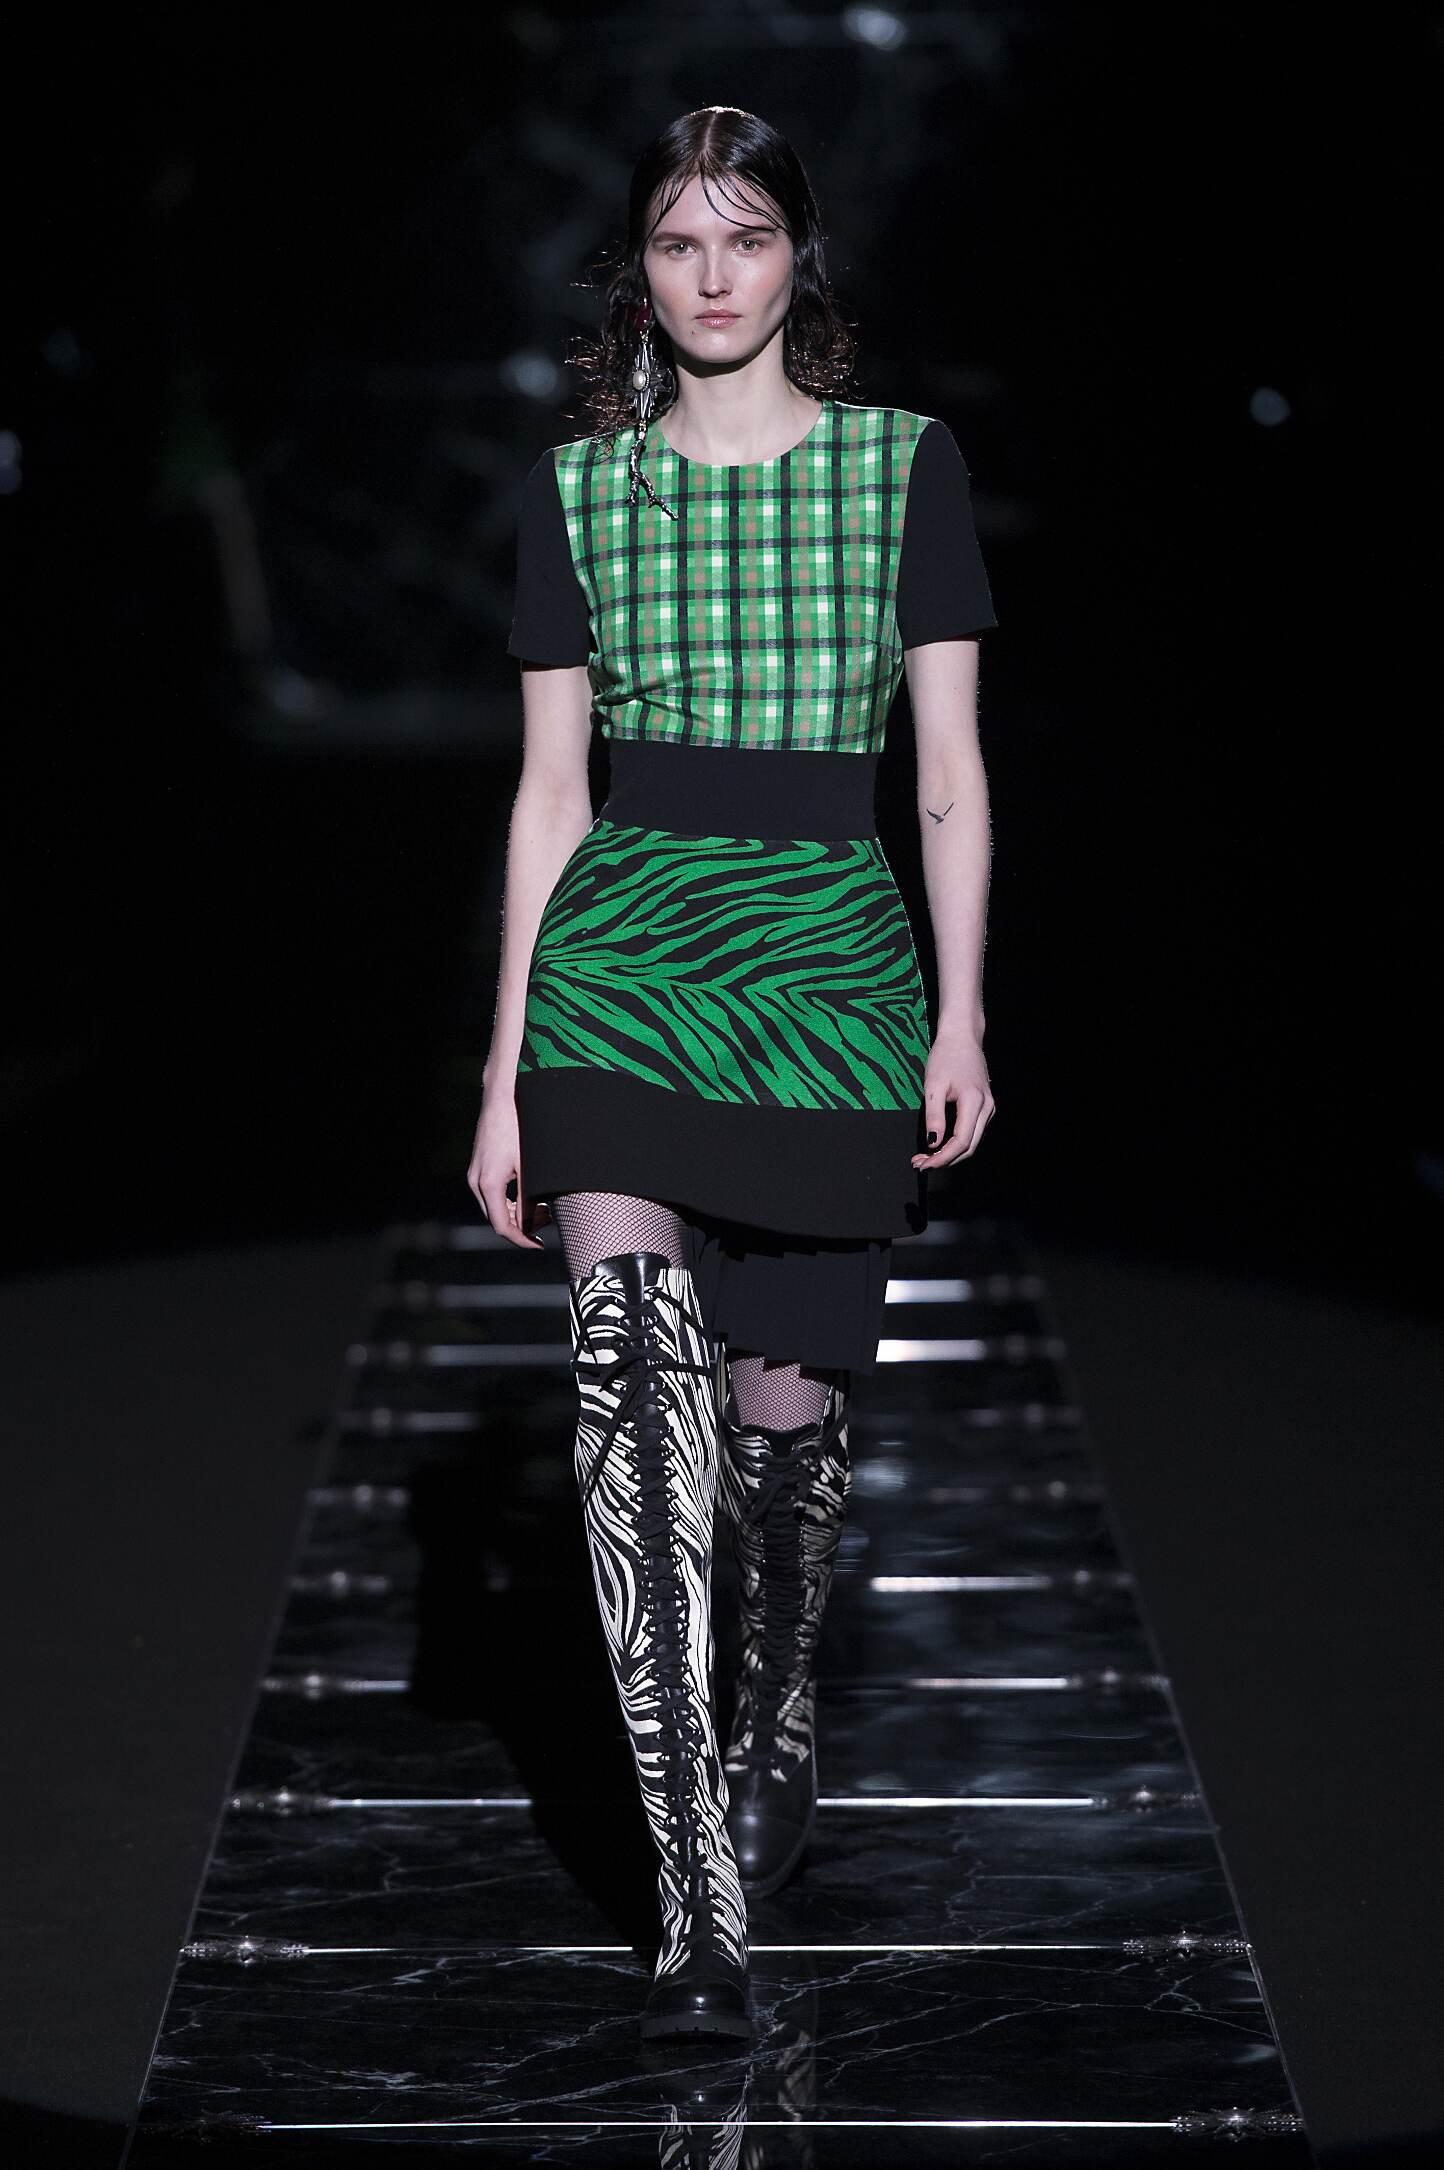 Fall 2015 Women Fashion Show Fausto Puglisi Collection